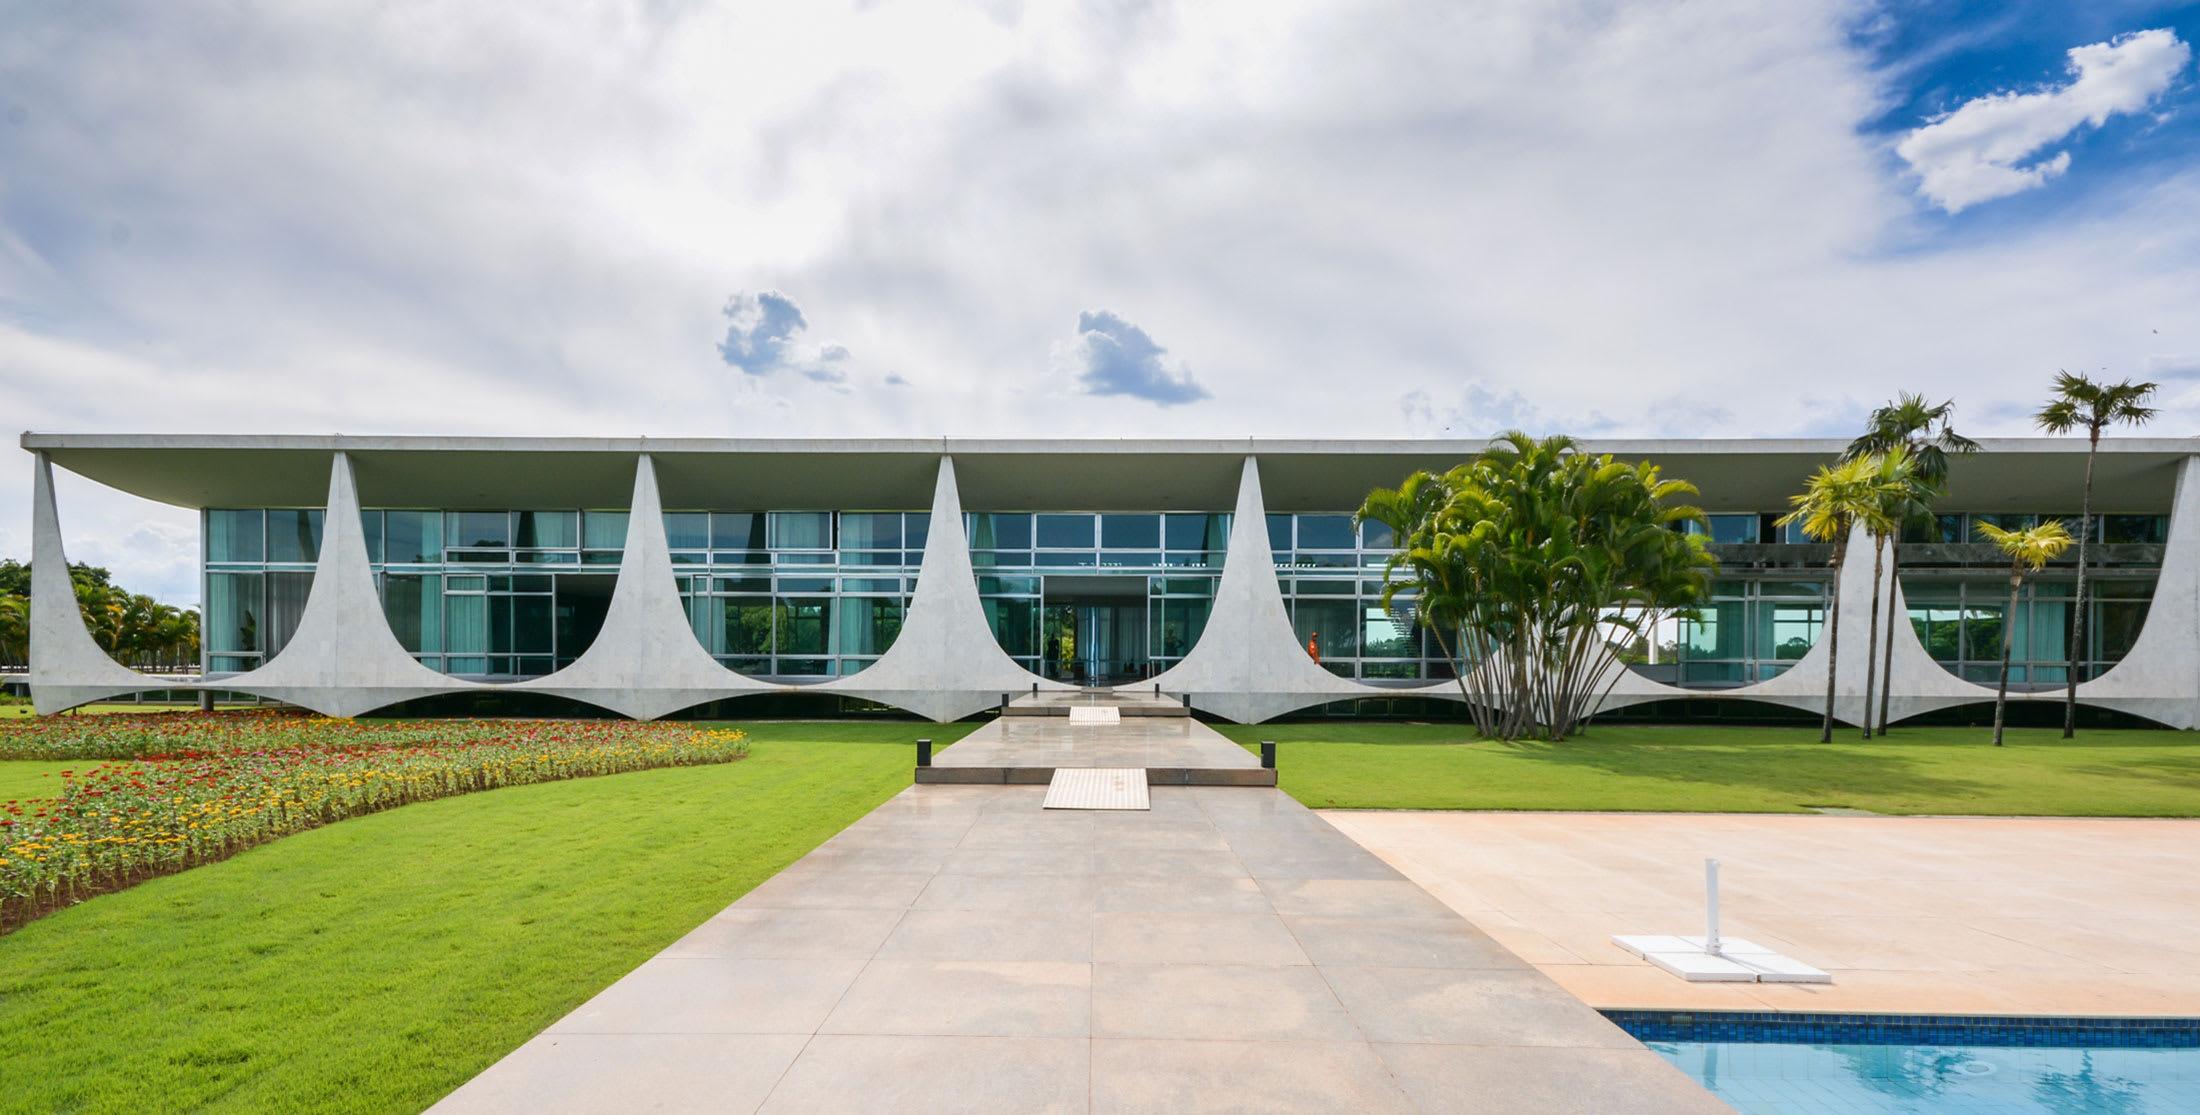 Oscar Niemeyer, Gonzalo Viramonte · Archnotitia Presidential Palaces